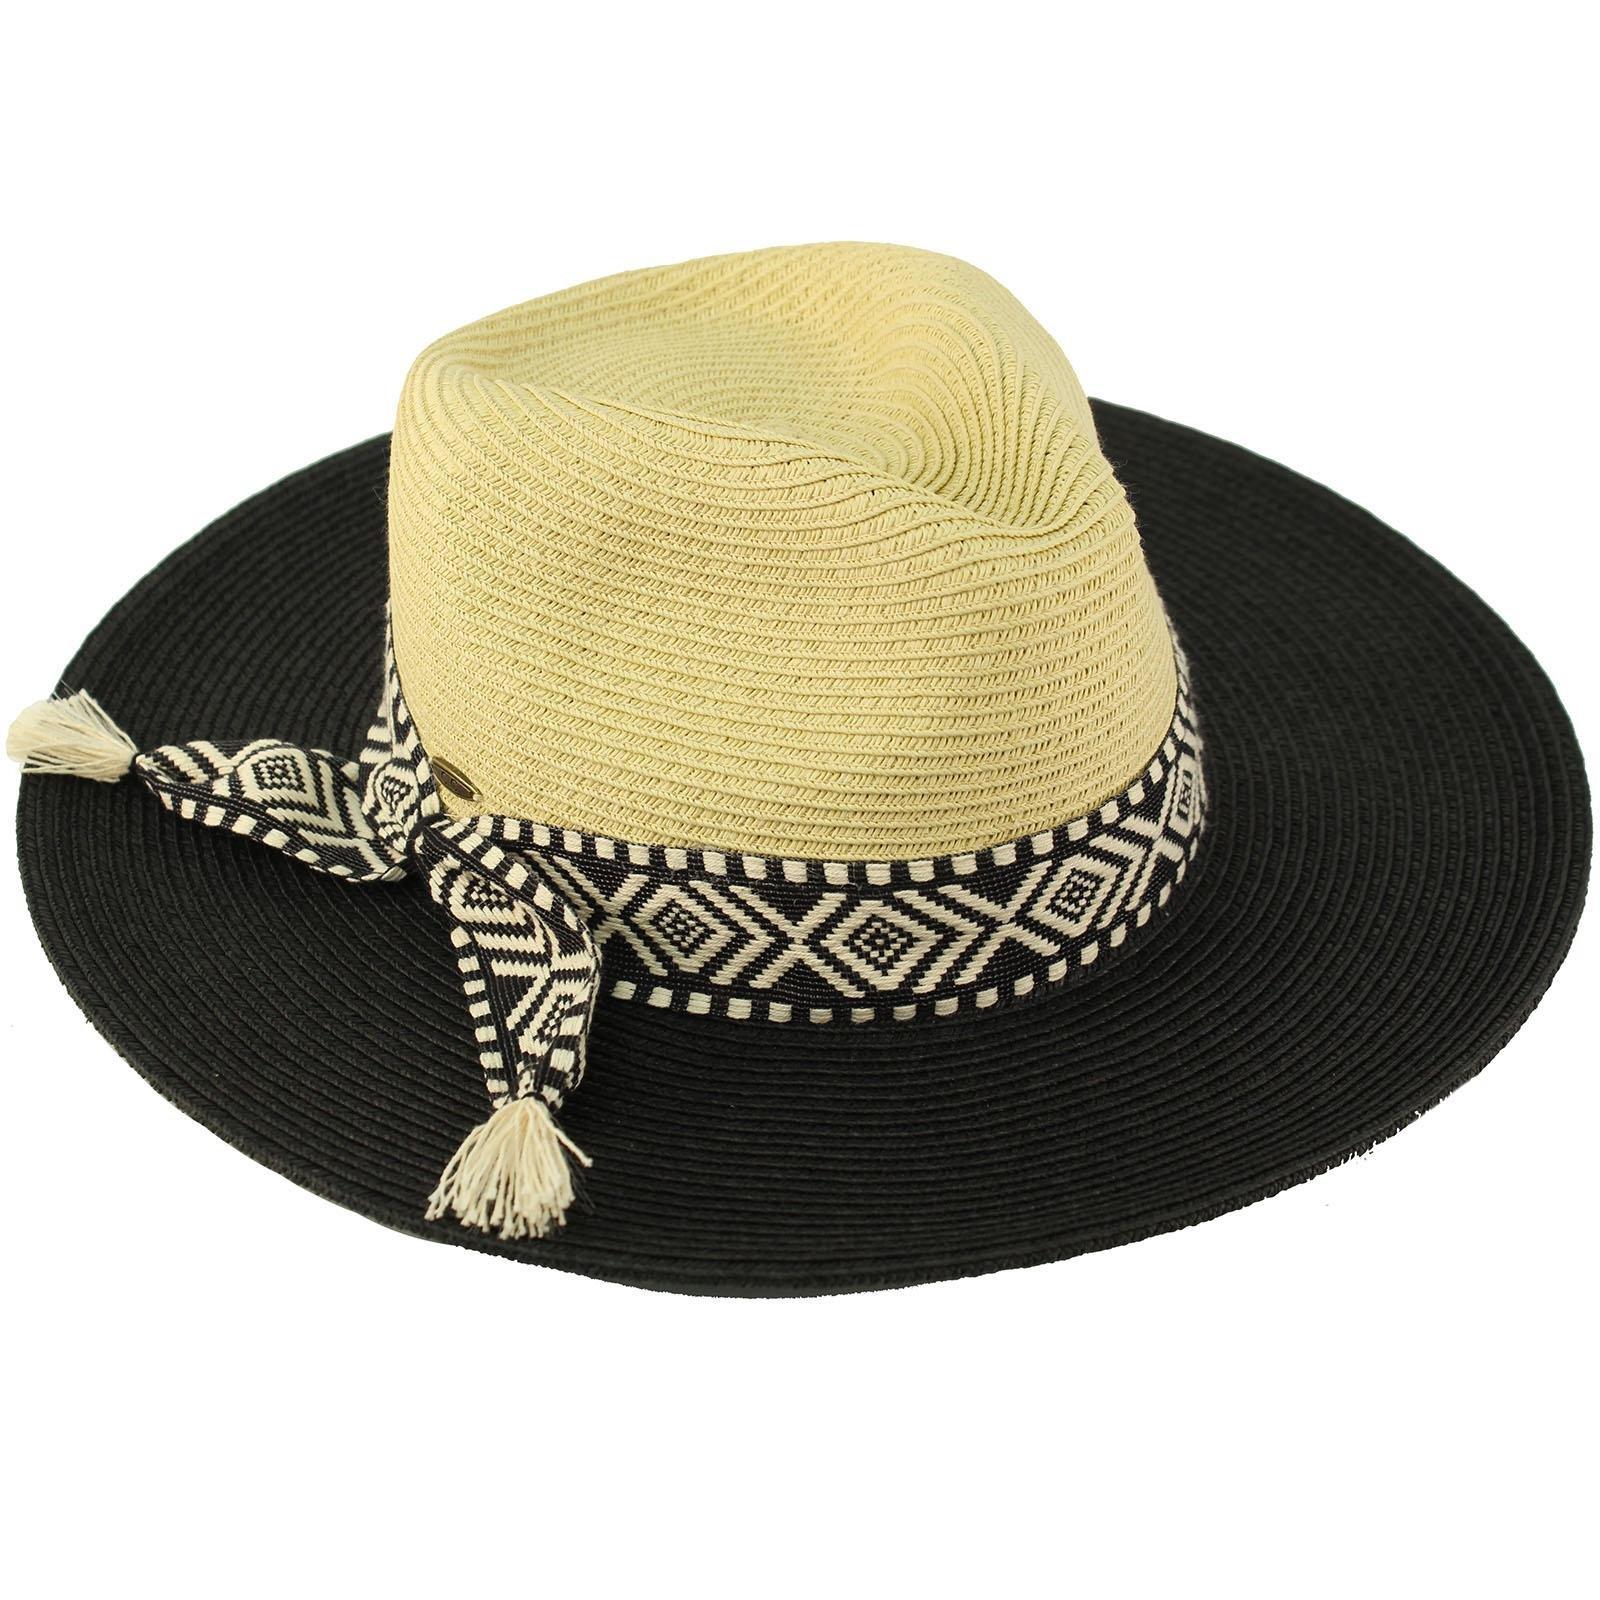 C.C Aztec Tassel Panama 2tone Fedora Wide Brim Summer Beach Pool Sun Hat Black